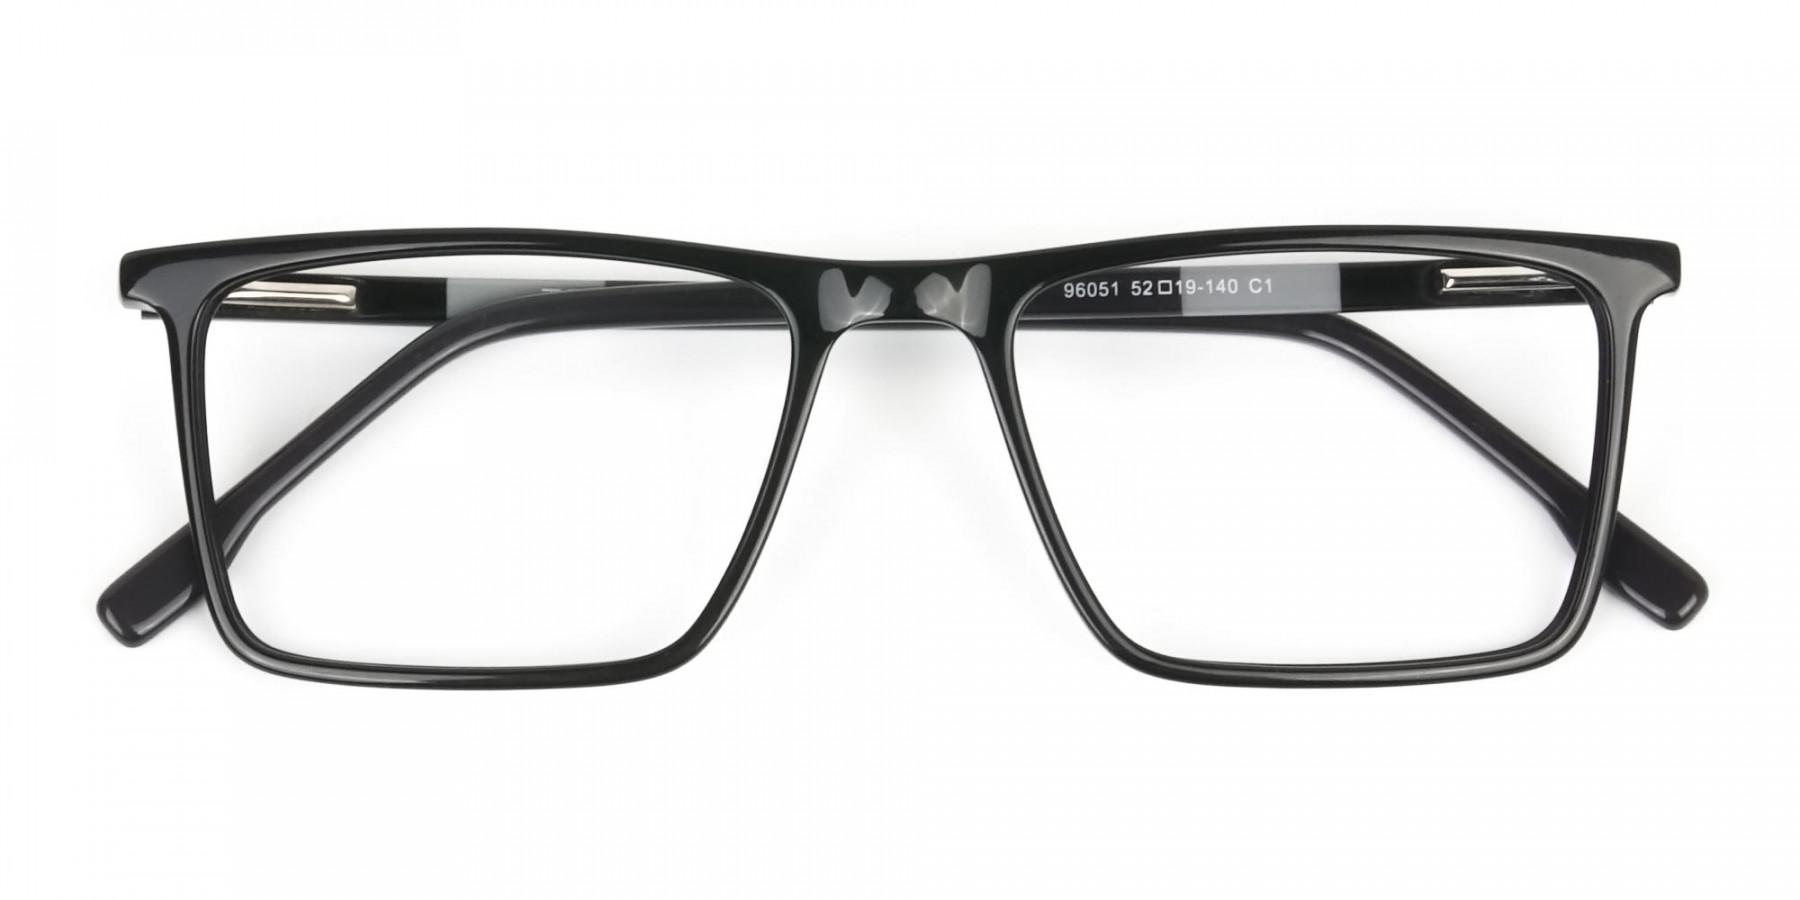 Unisex Black Rectangular Glasses - 1